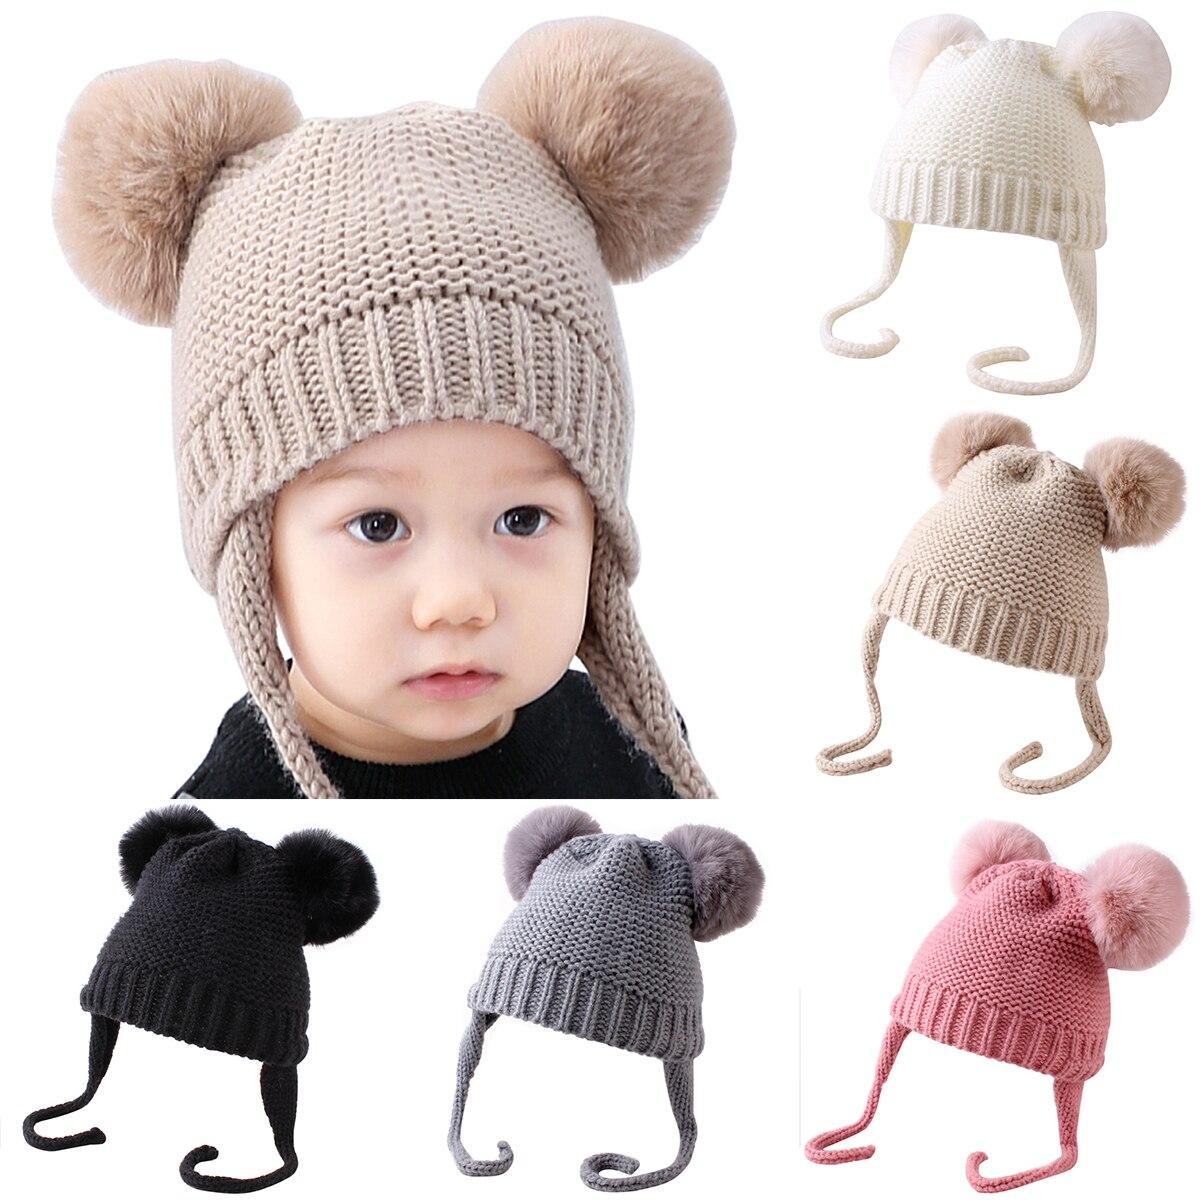 USA Baby Toddler Kids Girl/&Boy Infant Winter Warm Crochet Knit Hat Beanie Cap